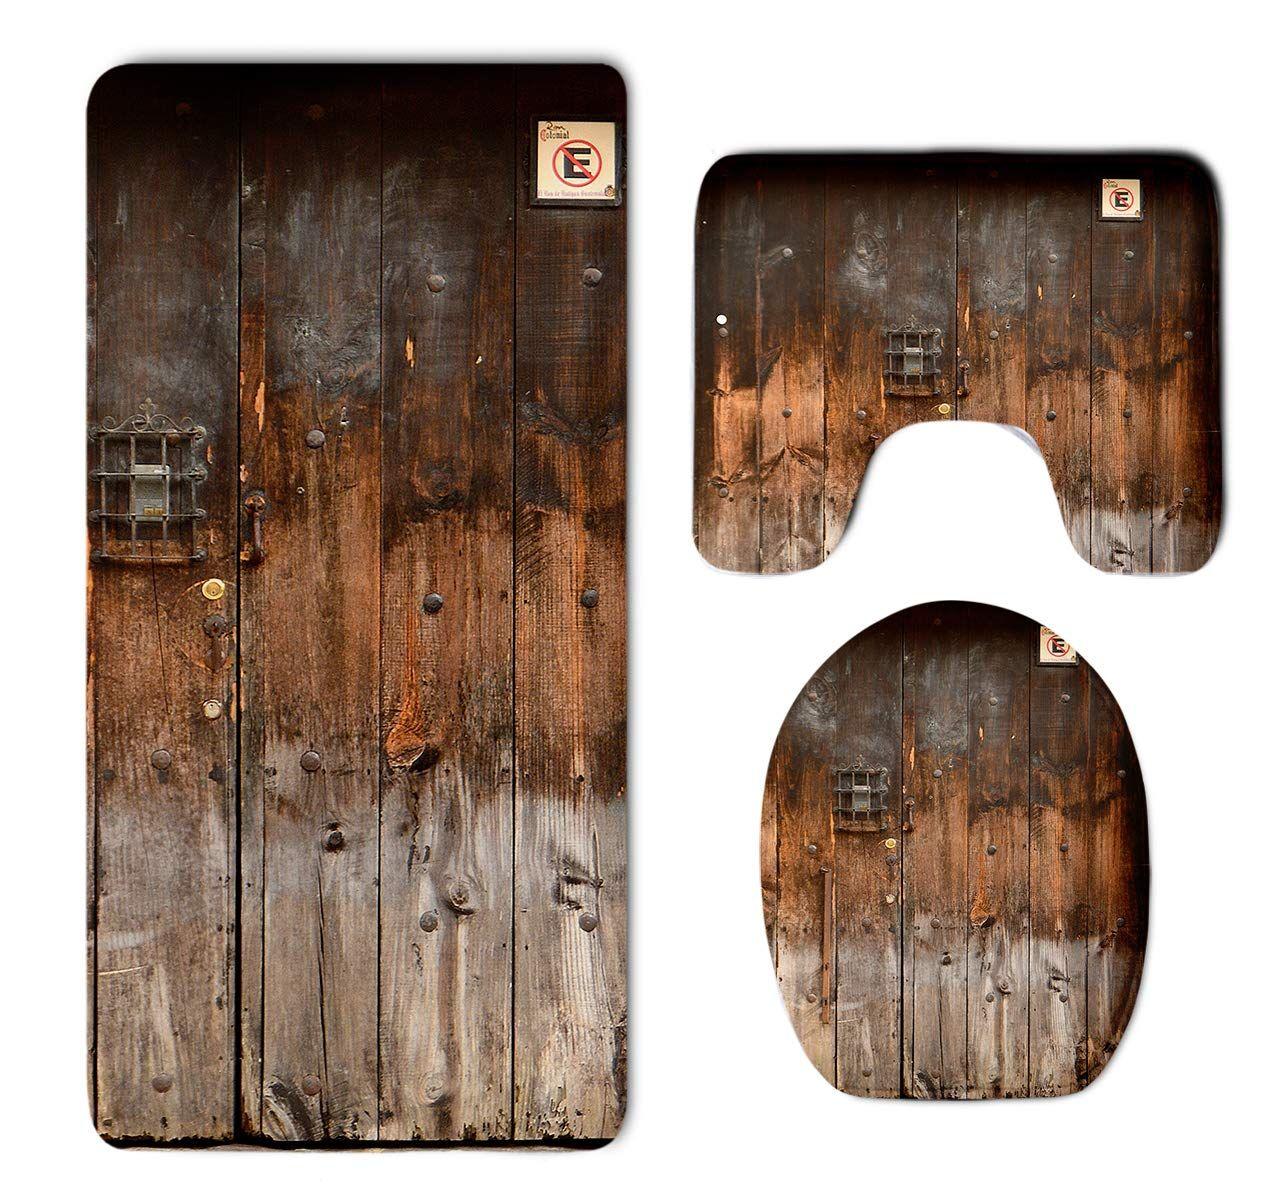 Homestores 3 Piece Bathroom Rug Set Rustic Country Wood Style Rustic Country Barn Wood Door Set Skidproof Toilet Bath Rug Bathroom Rug Sets Door Sets Bath Rug